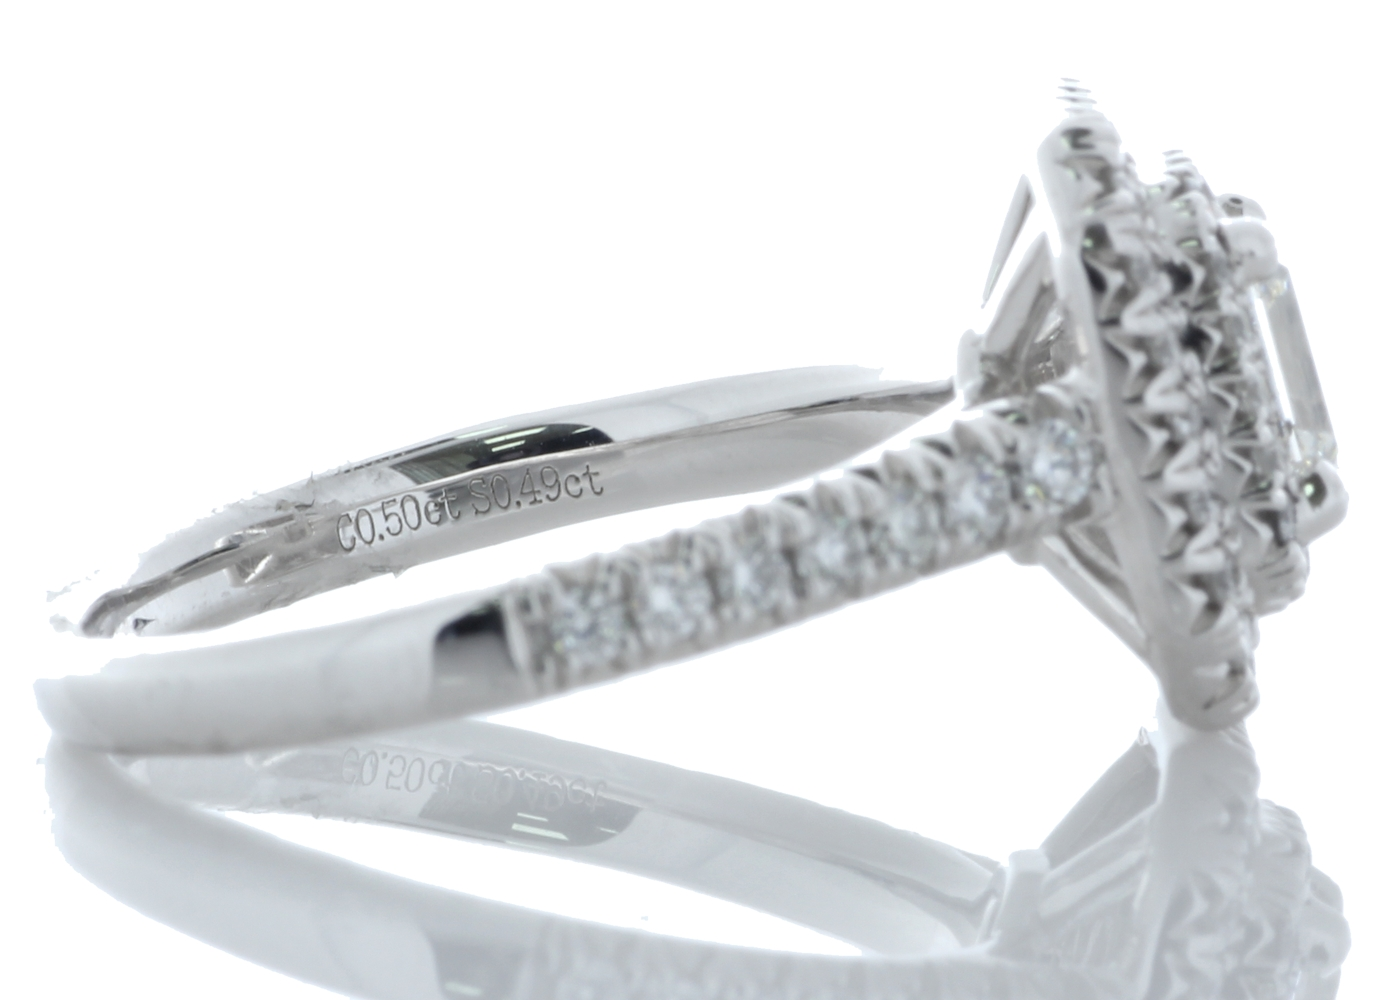 Platinum Single Stone With Halo Setting Ring 0.99 Carats - Image 2 of 4